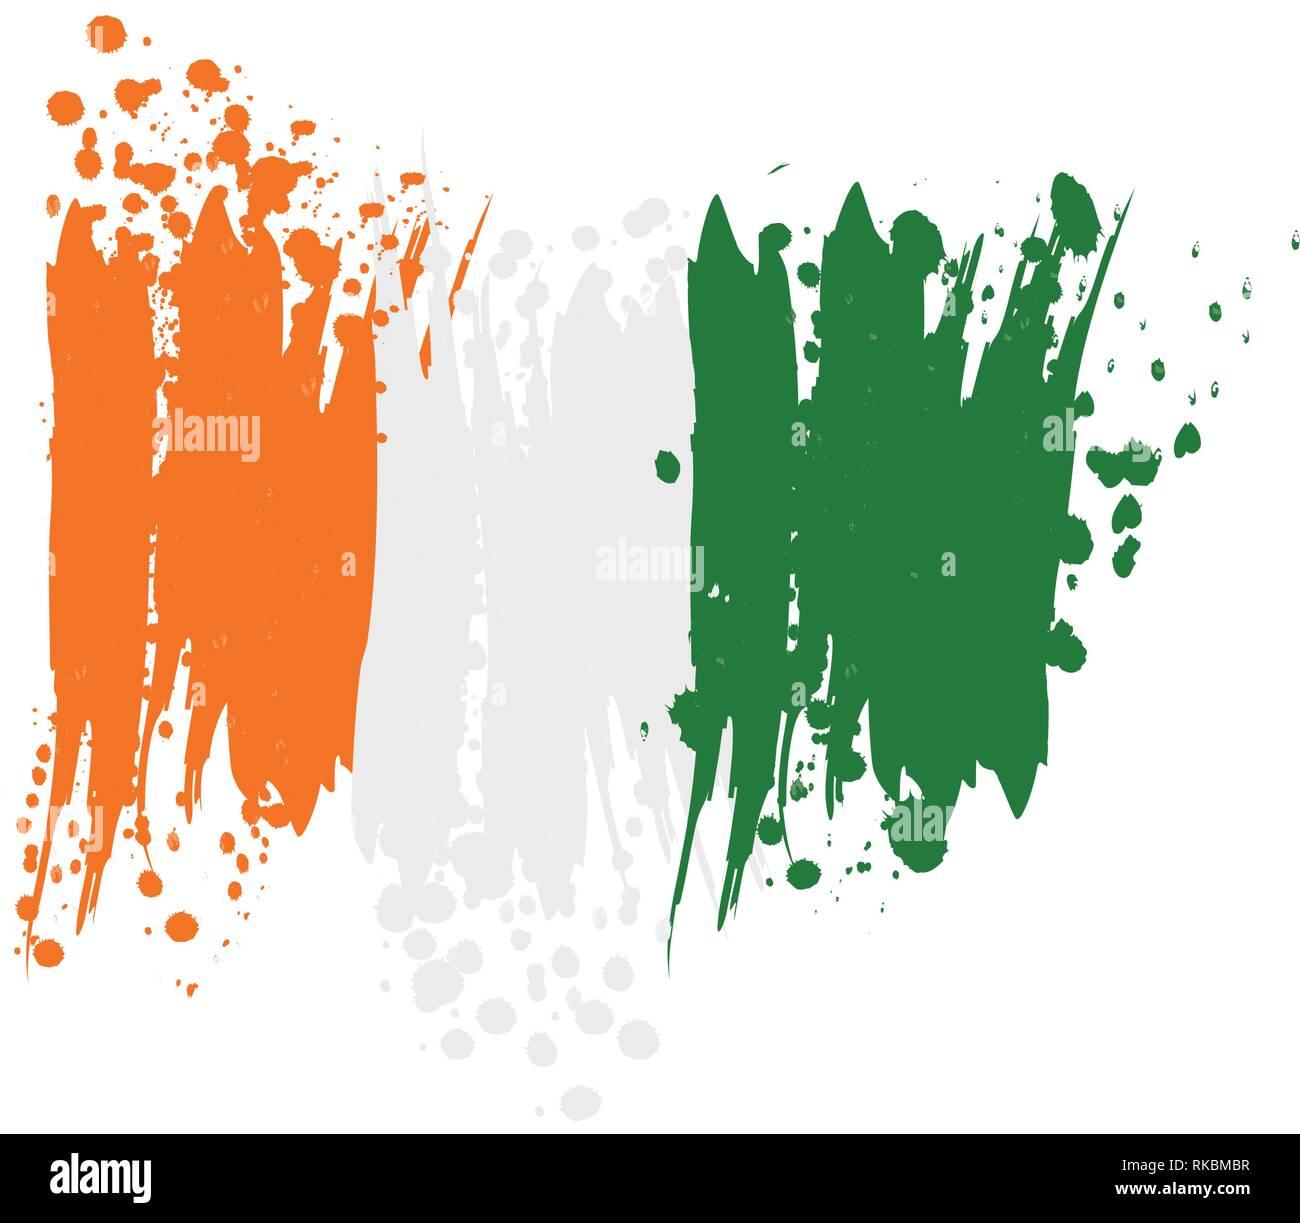 watercolor flag of Ireland, vector illustration design - Stock Image